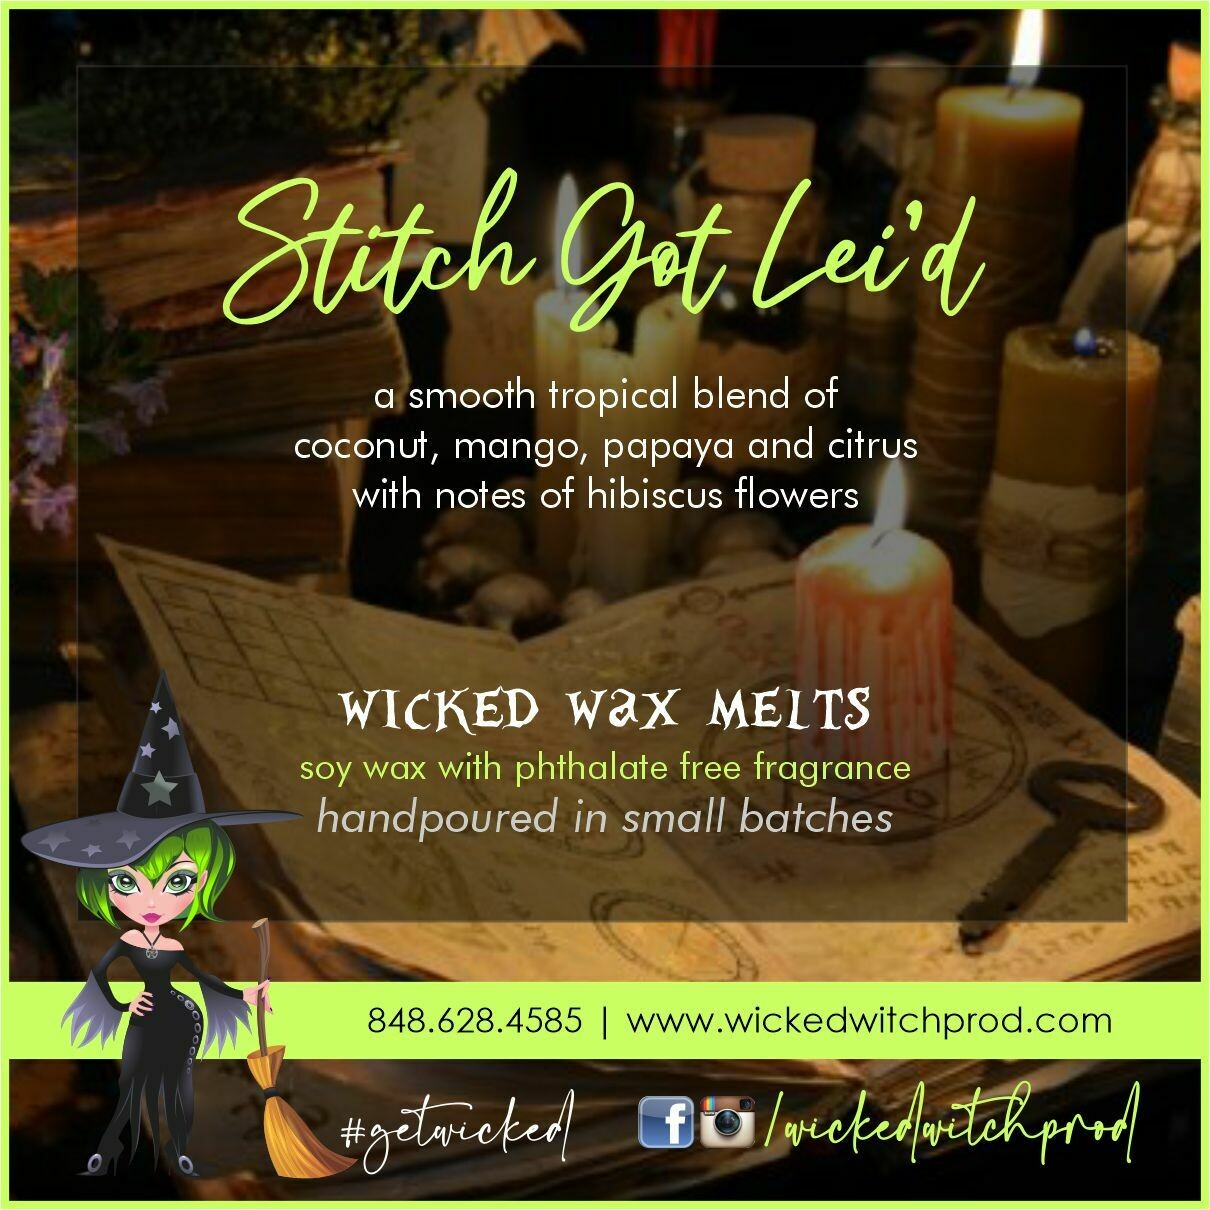 Stitch Got Lei'd Wicked Wax Melts